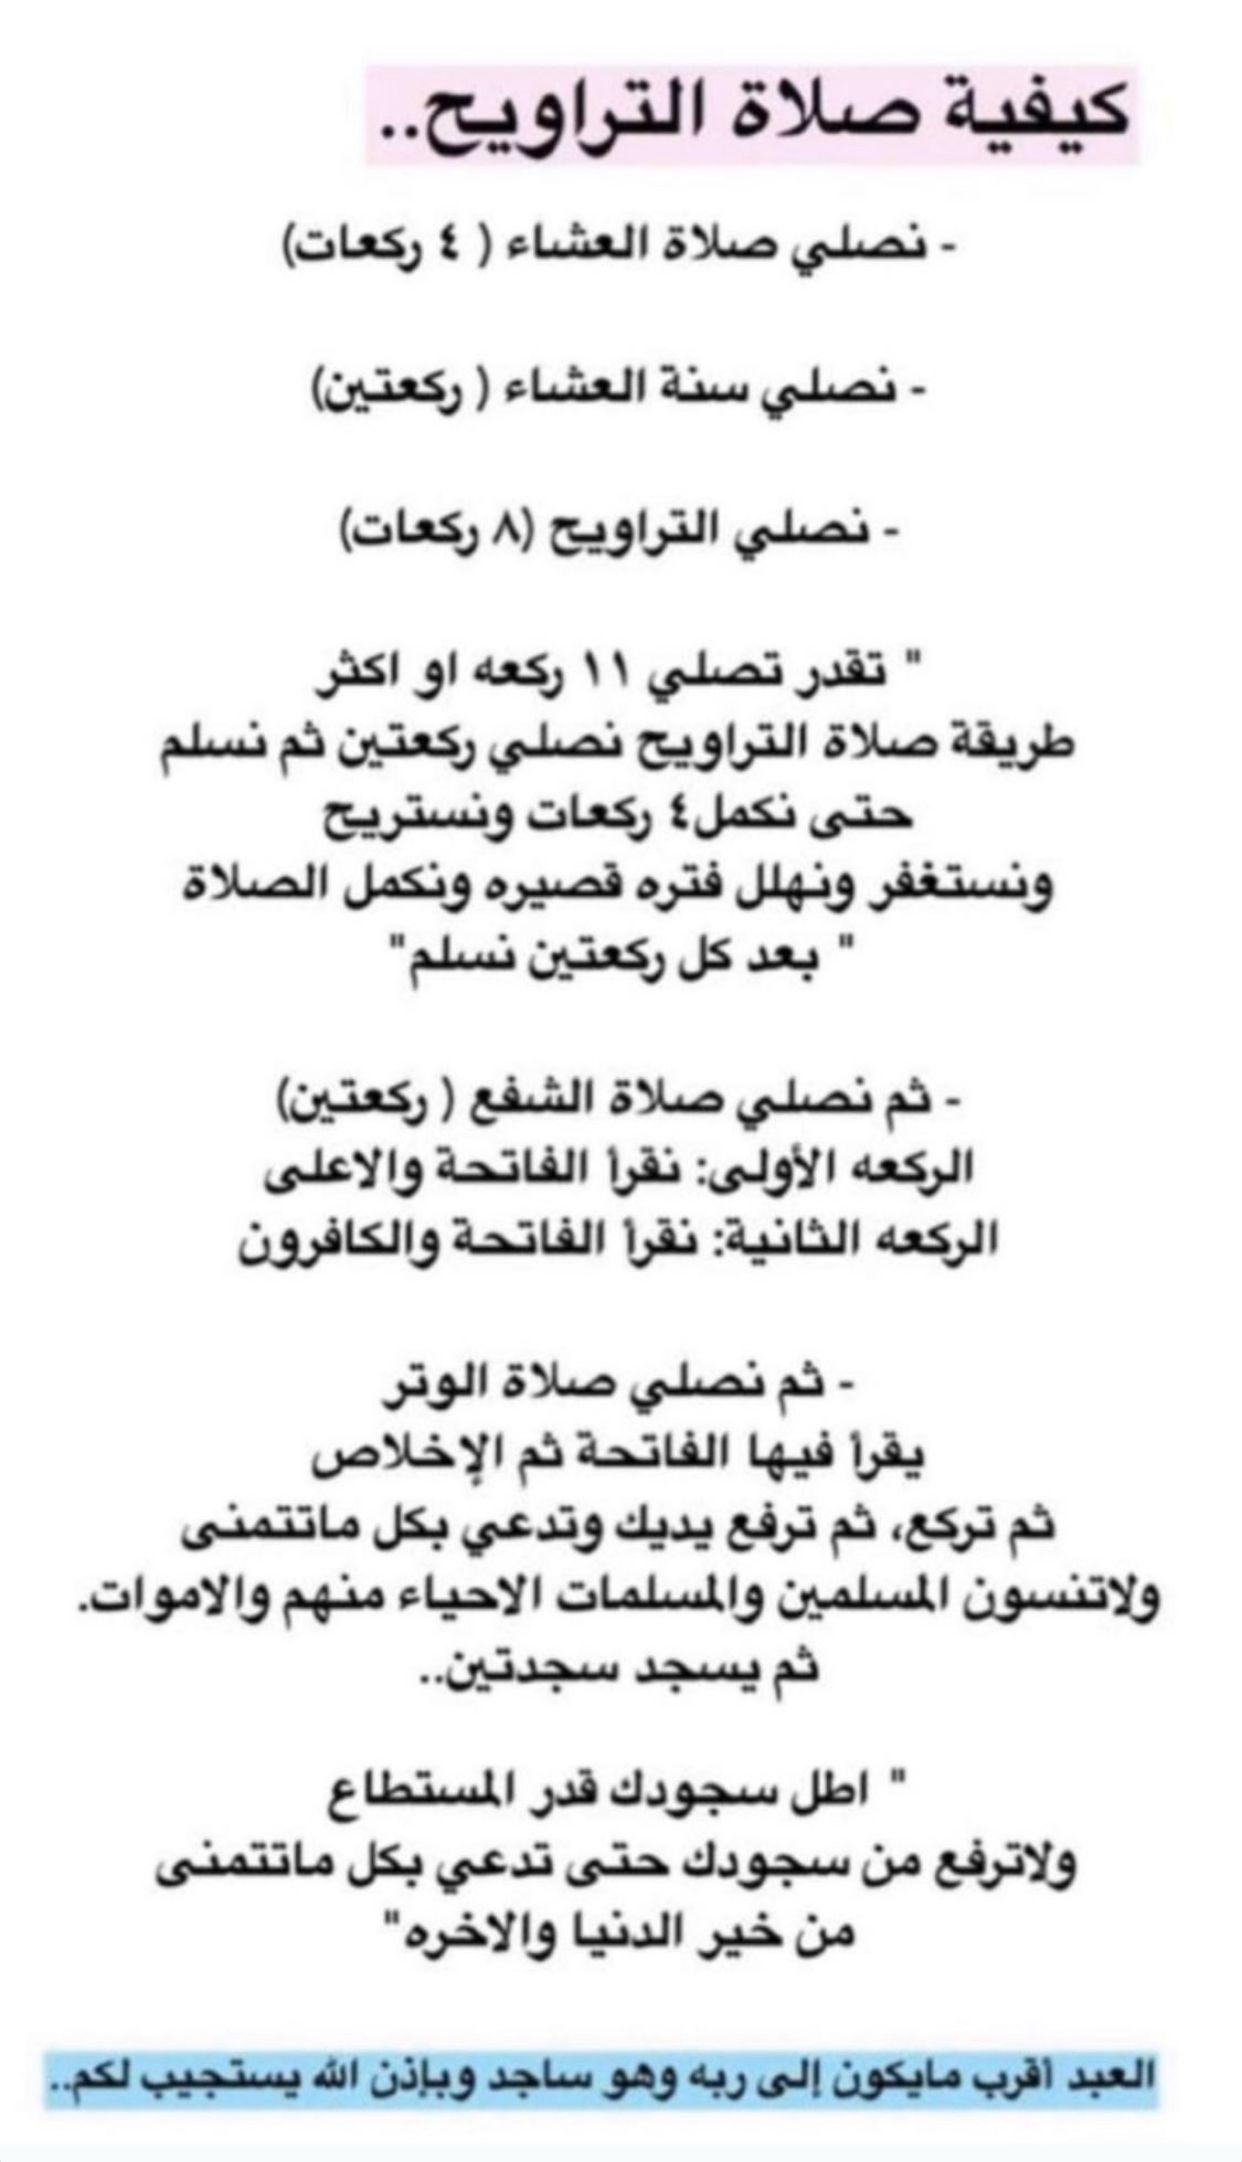 Pin By Alaa Erfan On ذكر الله Math Math Equations